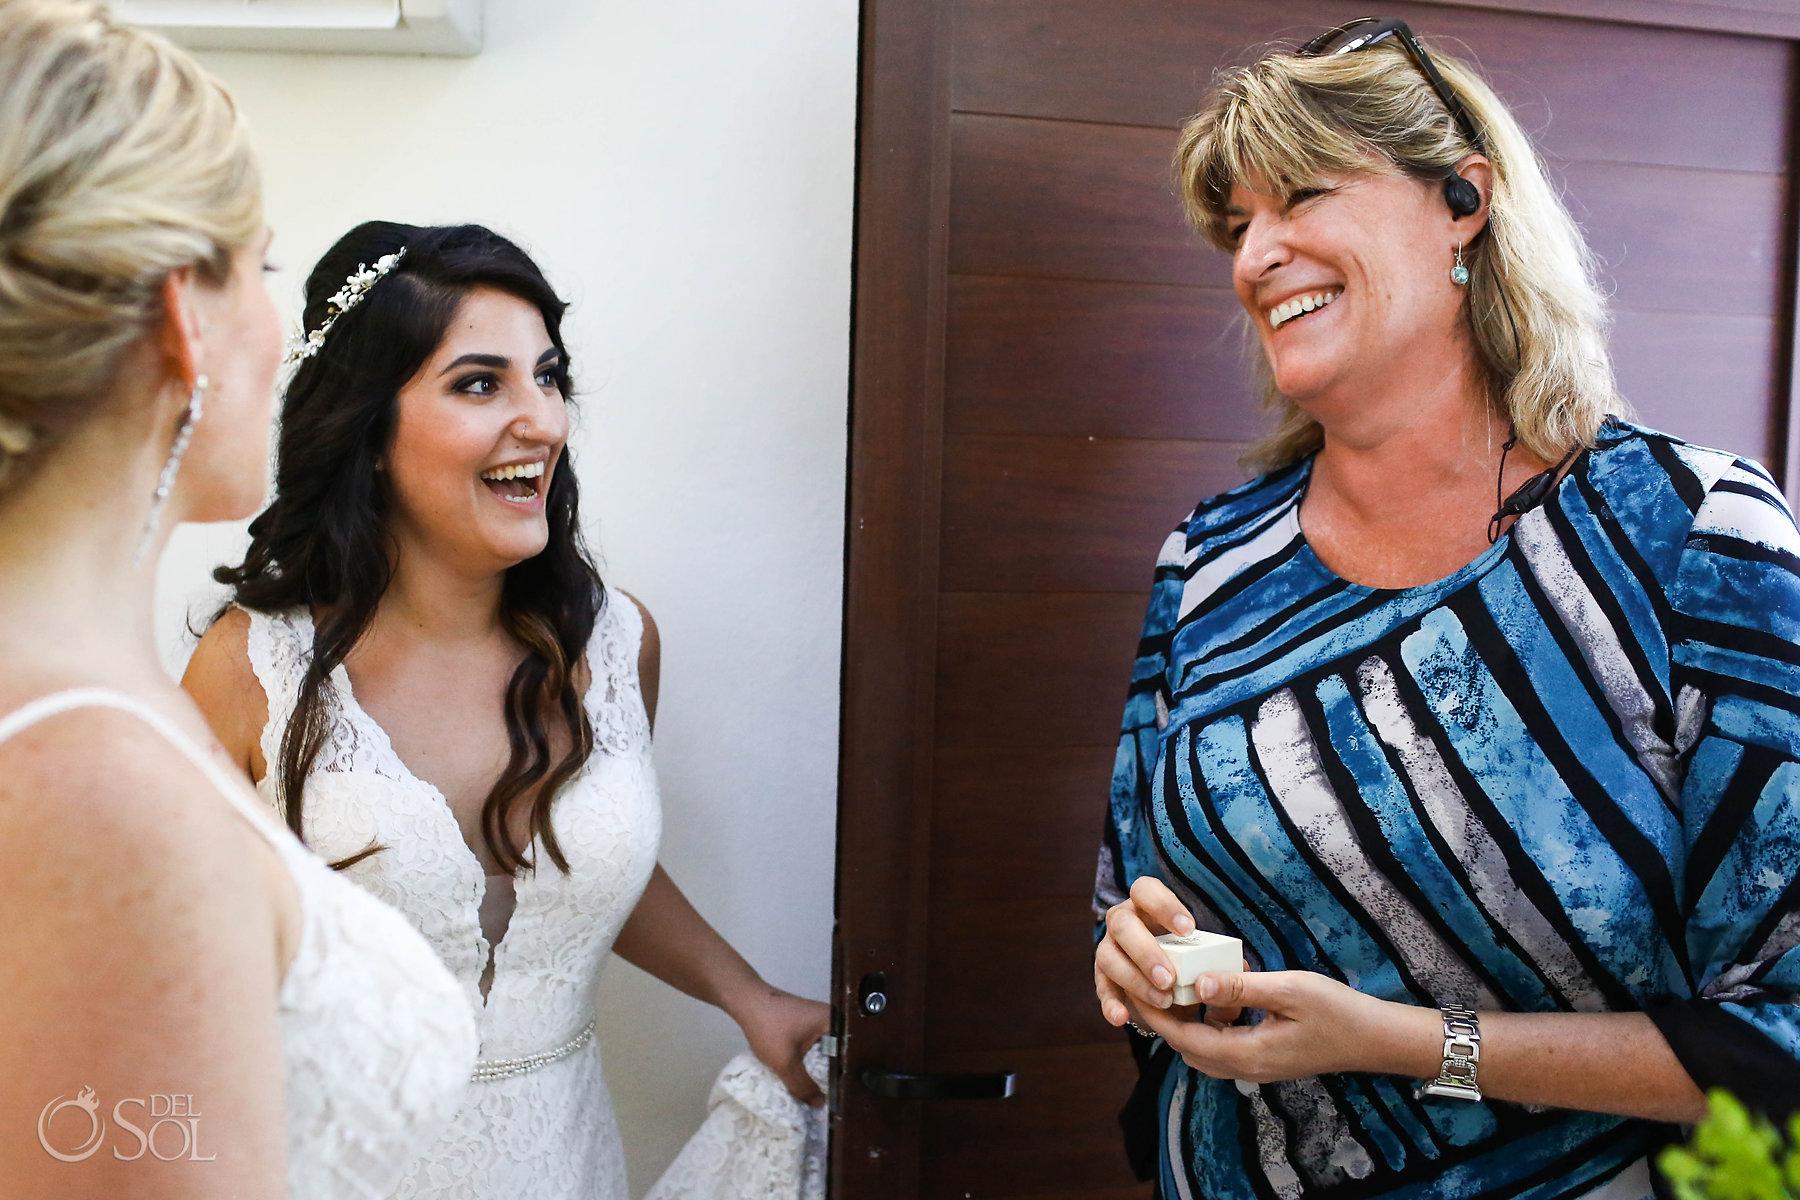 Isla Mujeres lesbian wedding coordinator Tiffany Lanier